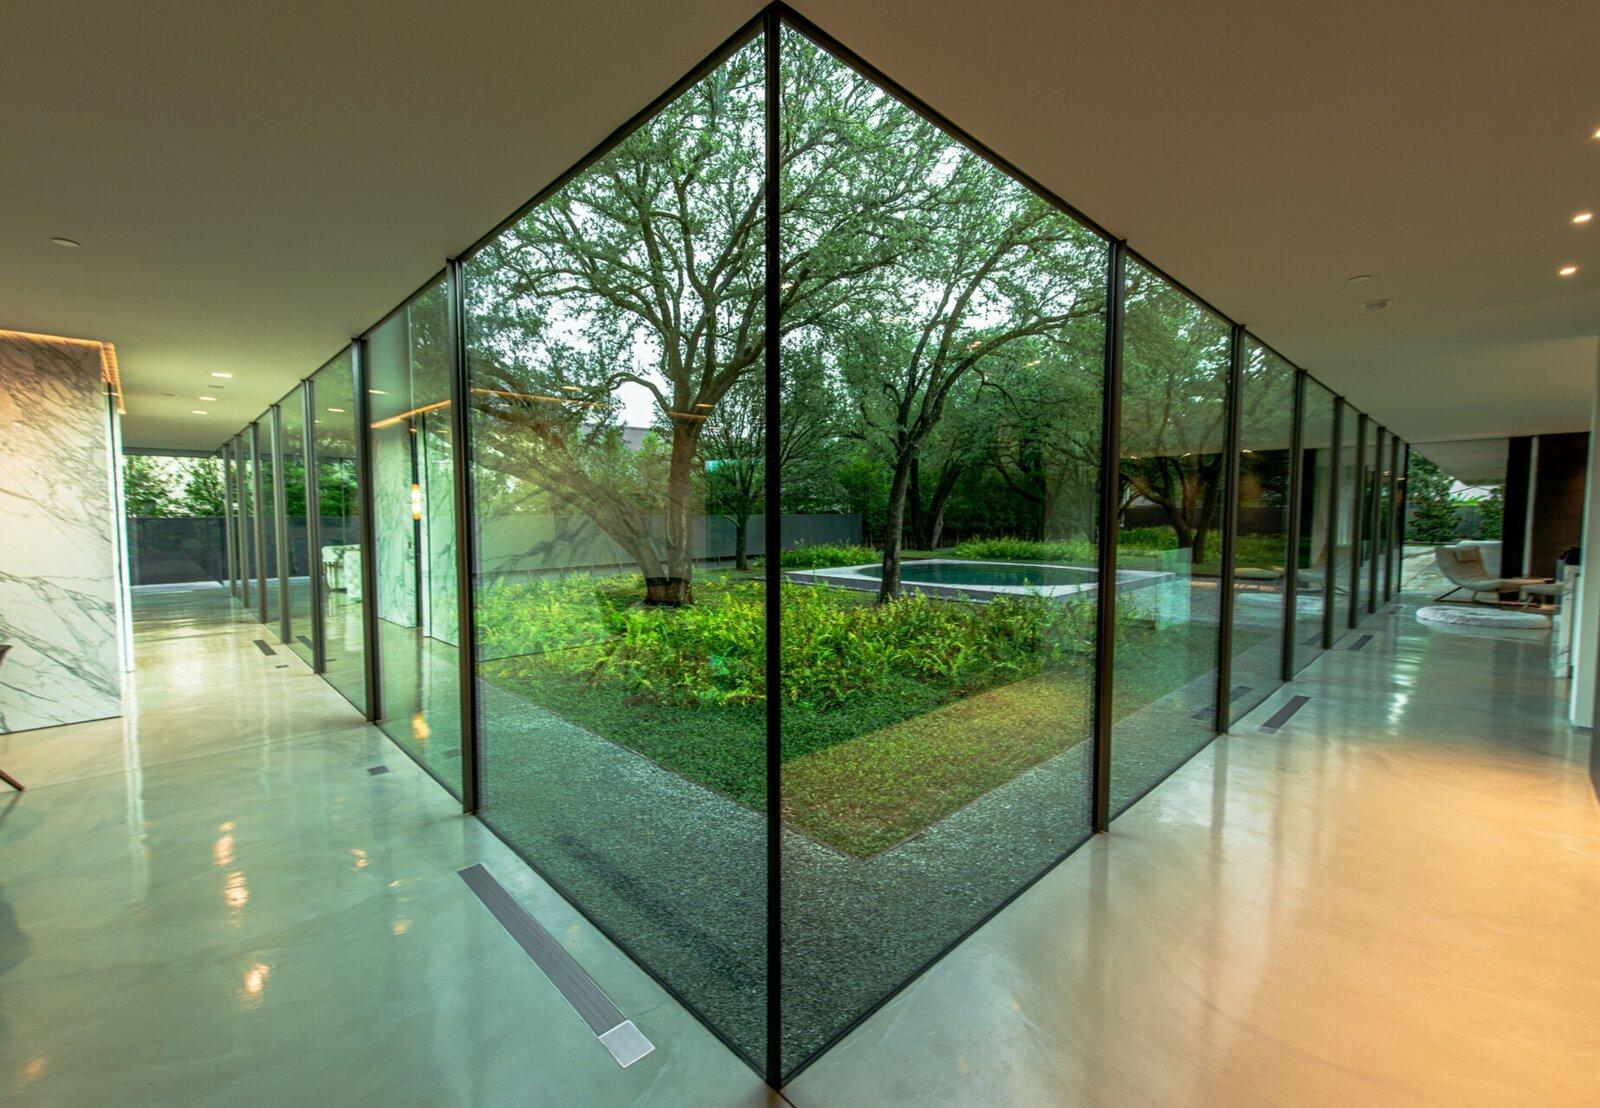 Photo 4 of 10 in A Farnsworth-Inspired Contemporary Home in Dallas Asks $7.9M